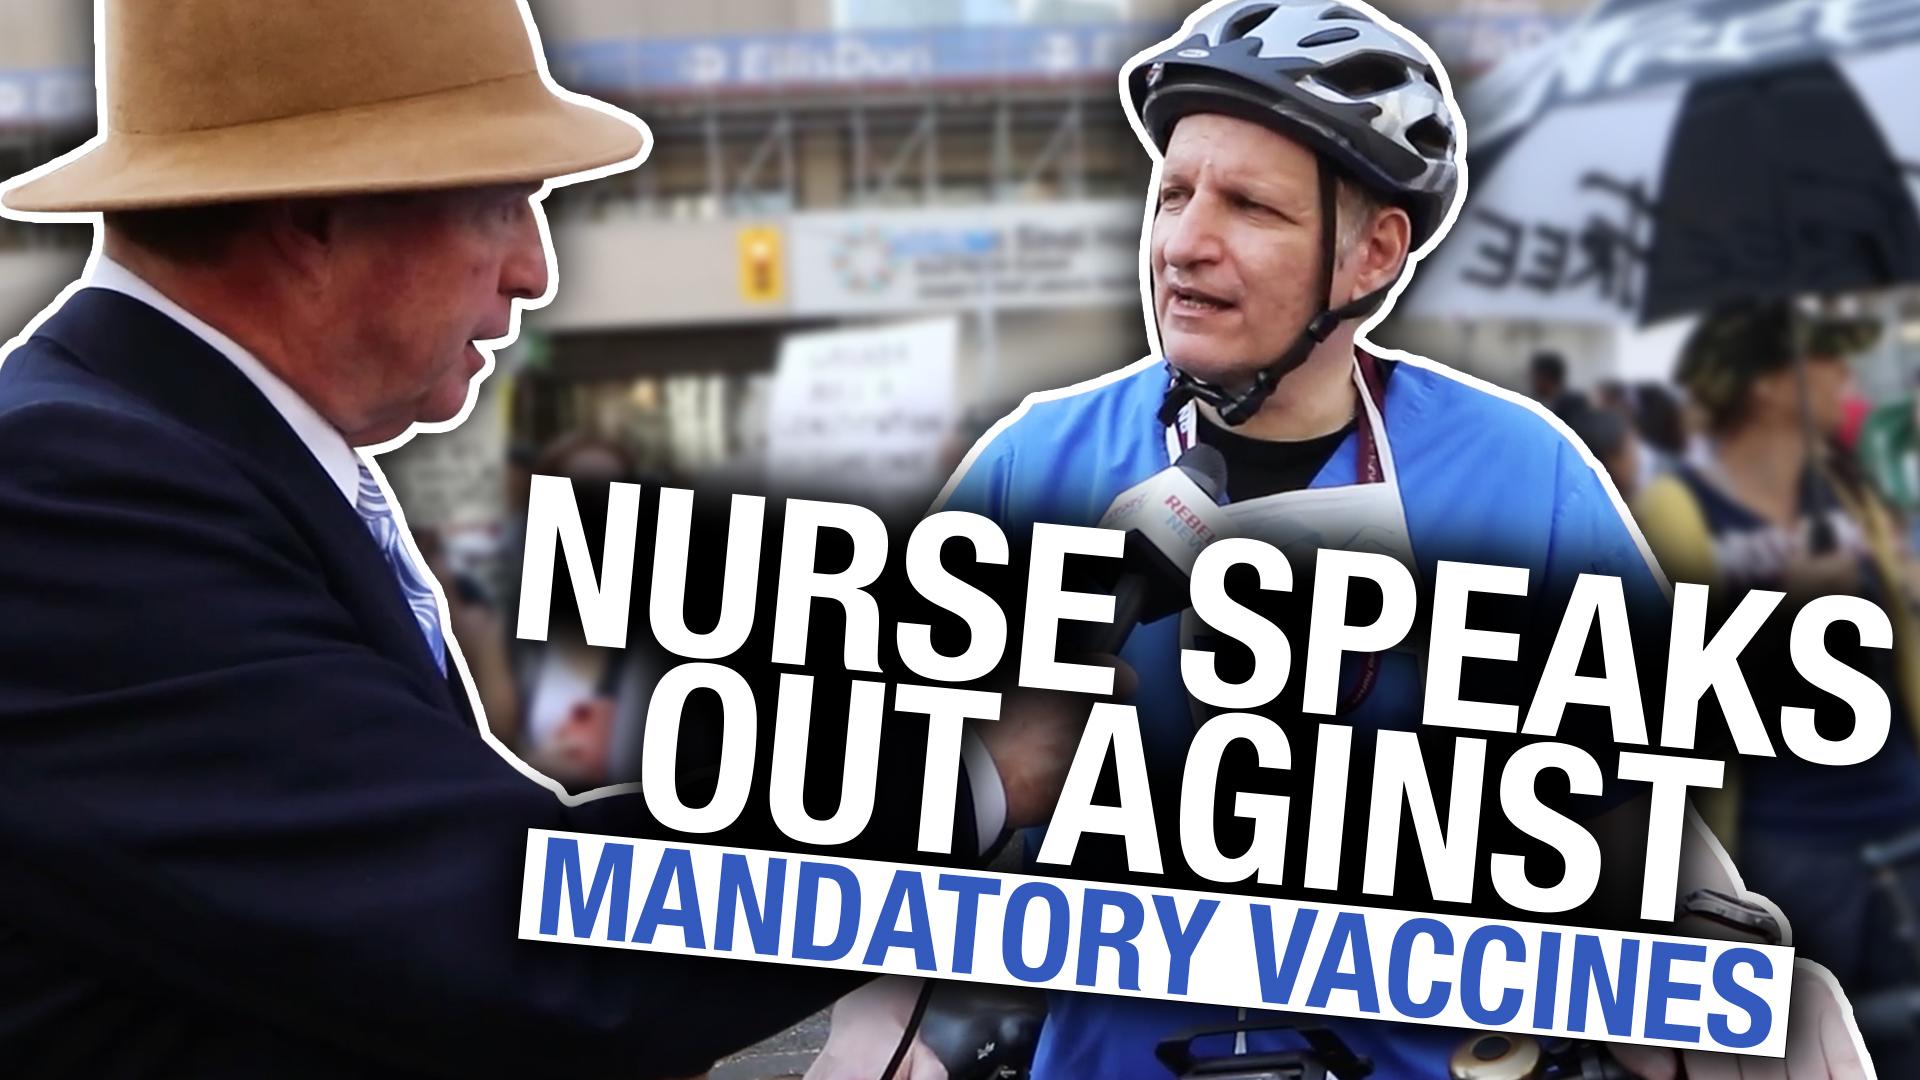 Ontario nurse shares his opinion on COVID vaccines